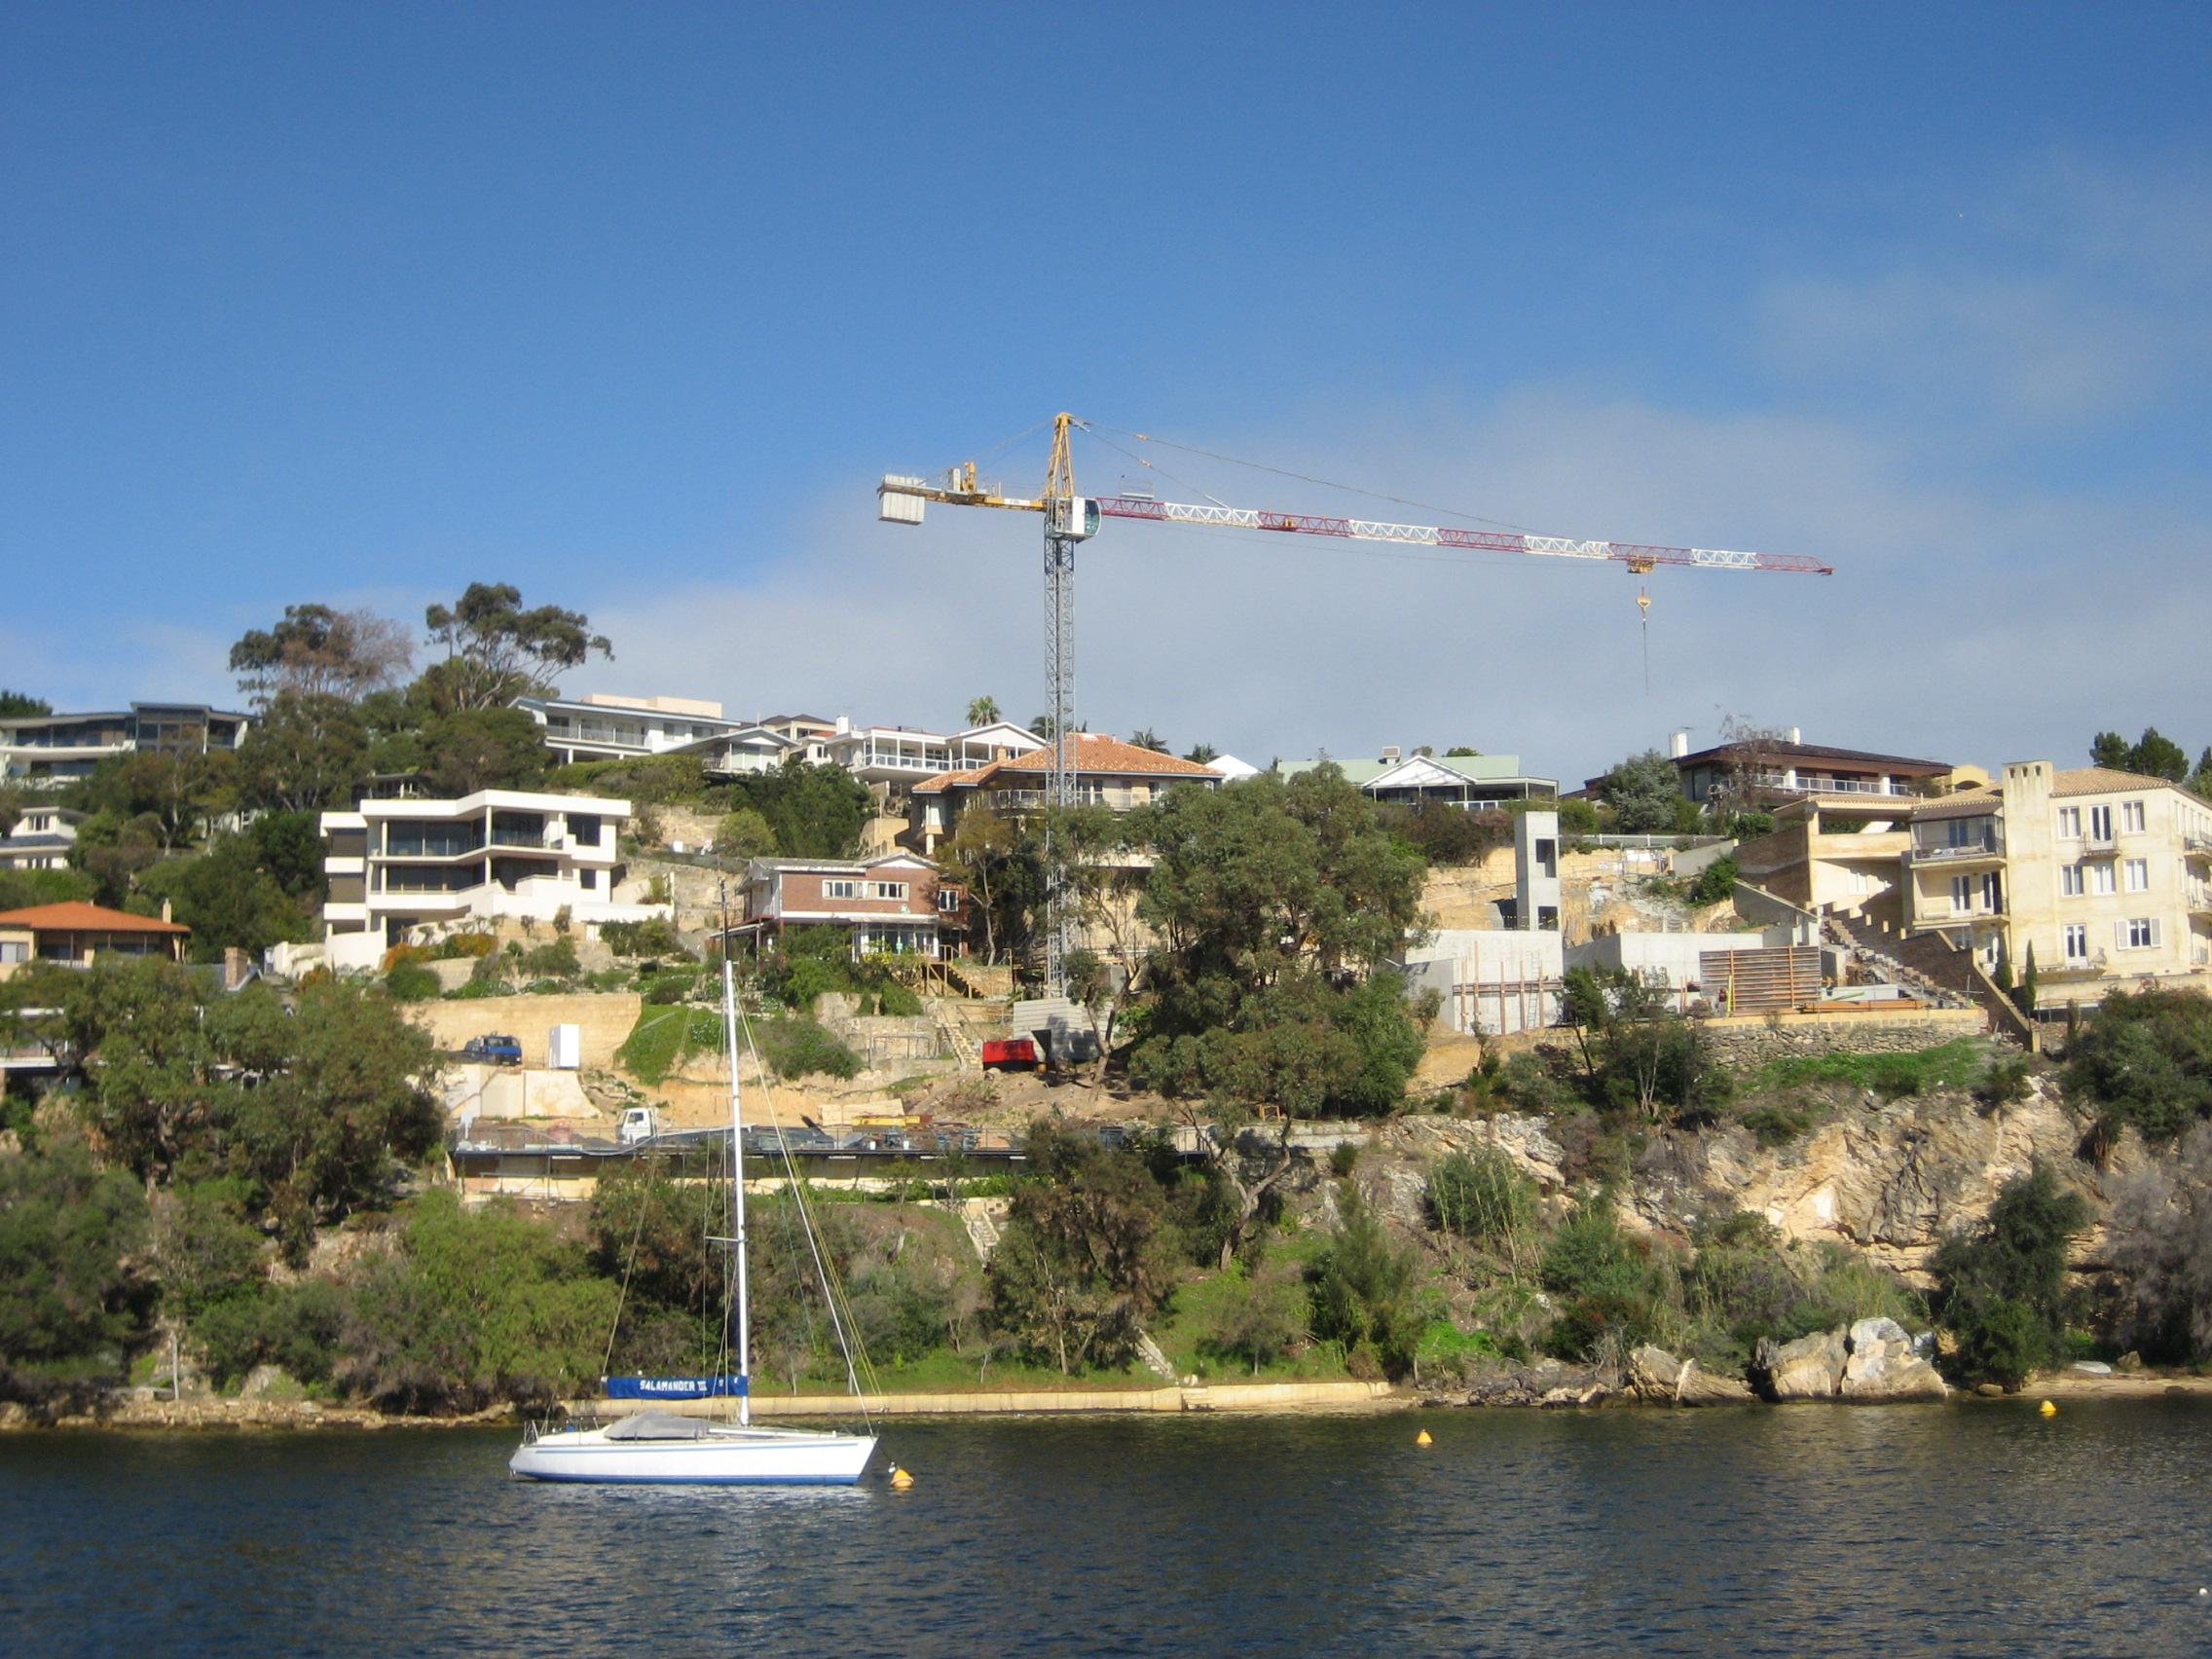 New contemporary build_residential_mosman park6.JPG